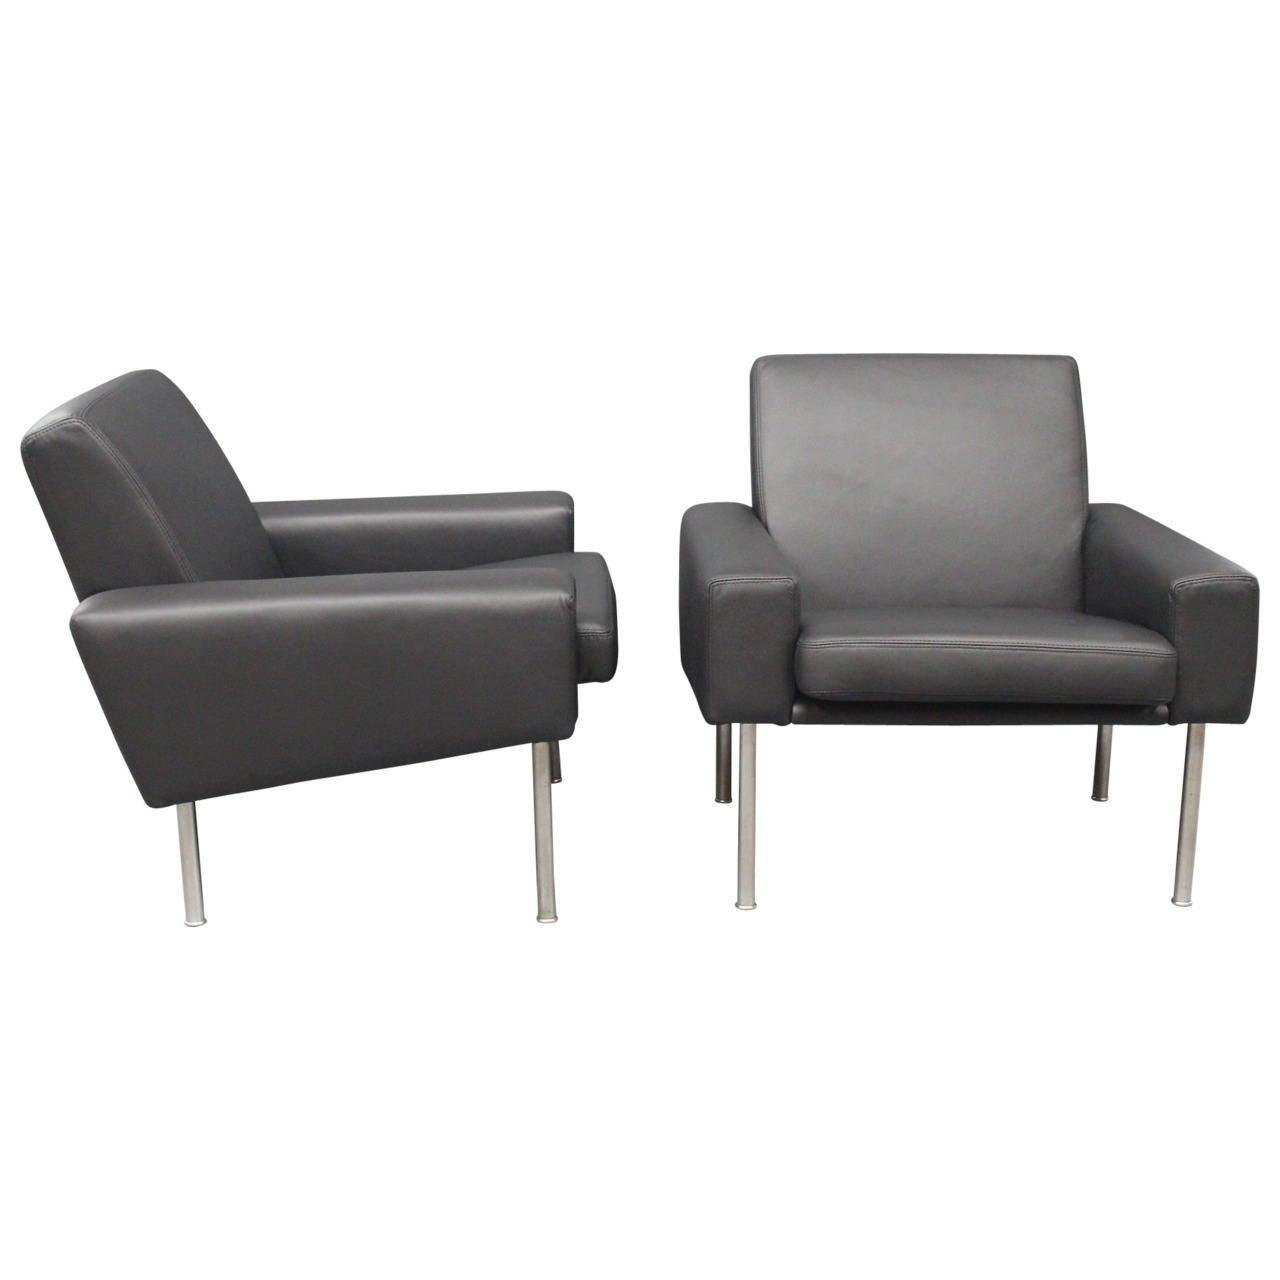 Pair of Lounge Chairs, Model 34/1, Black Savanne Leather by Hans Wegner, 1960